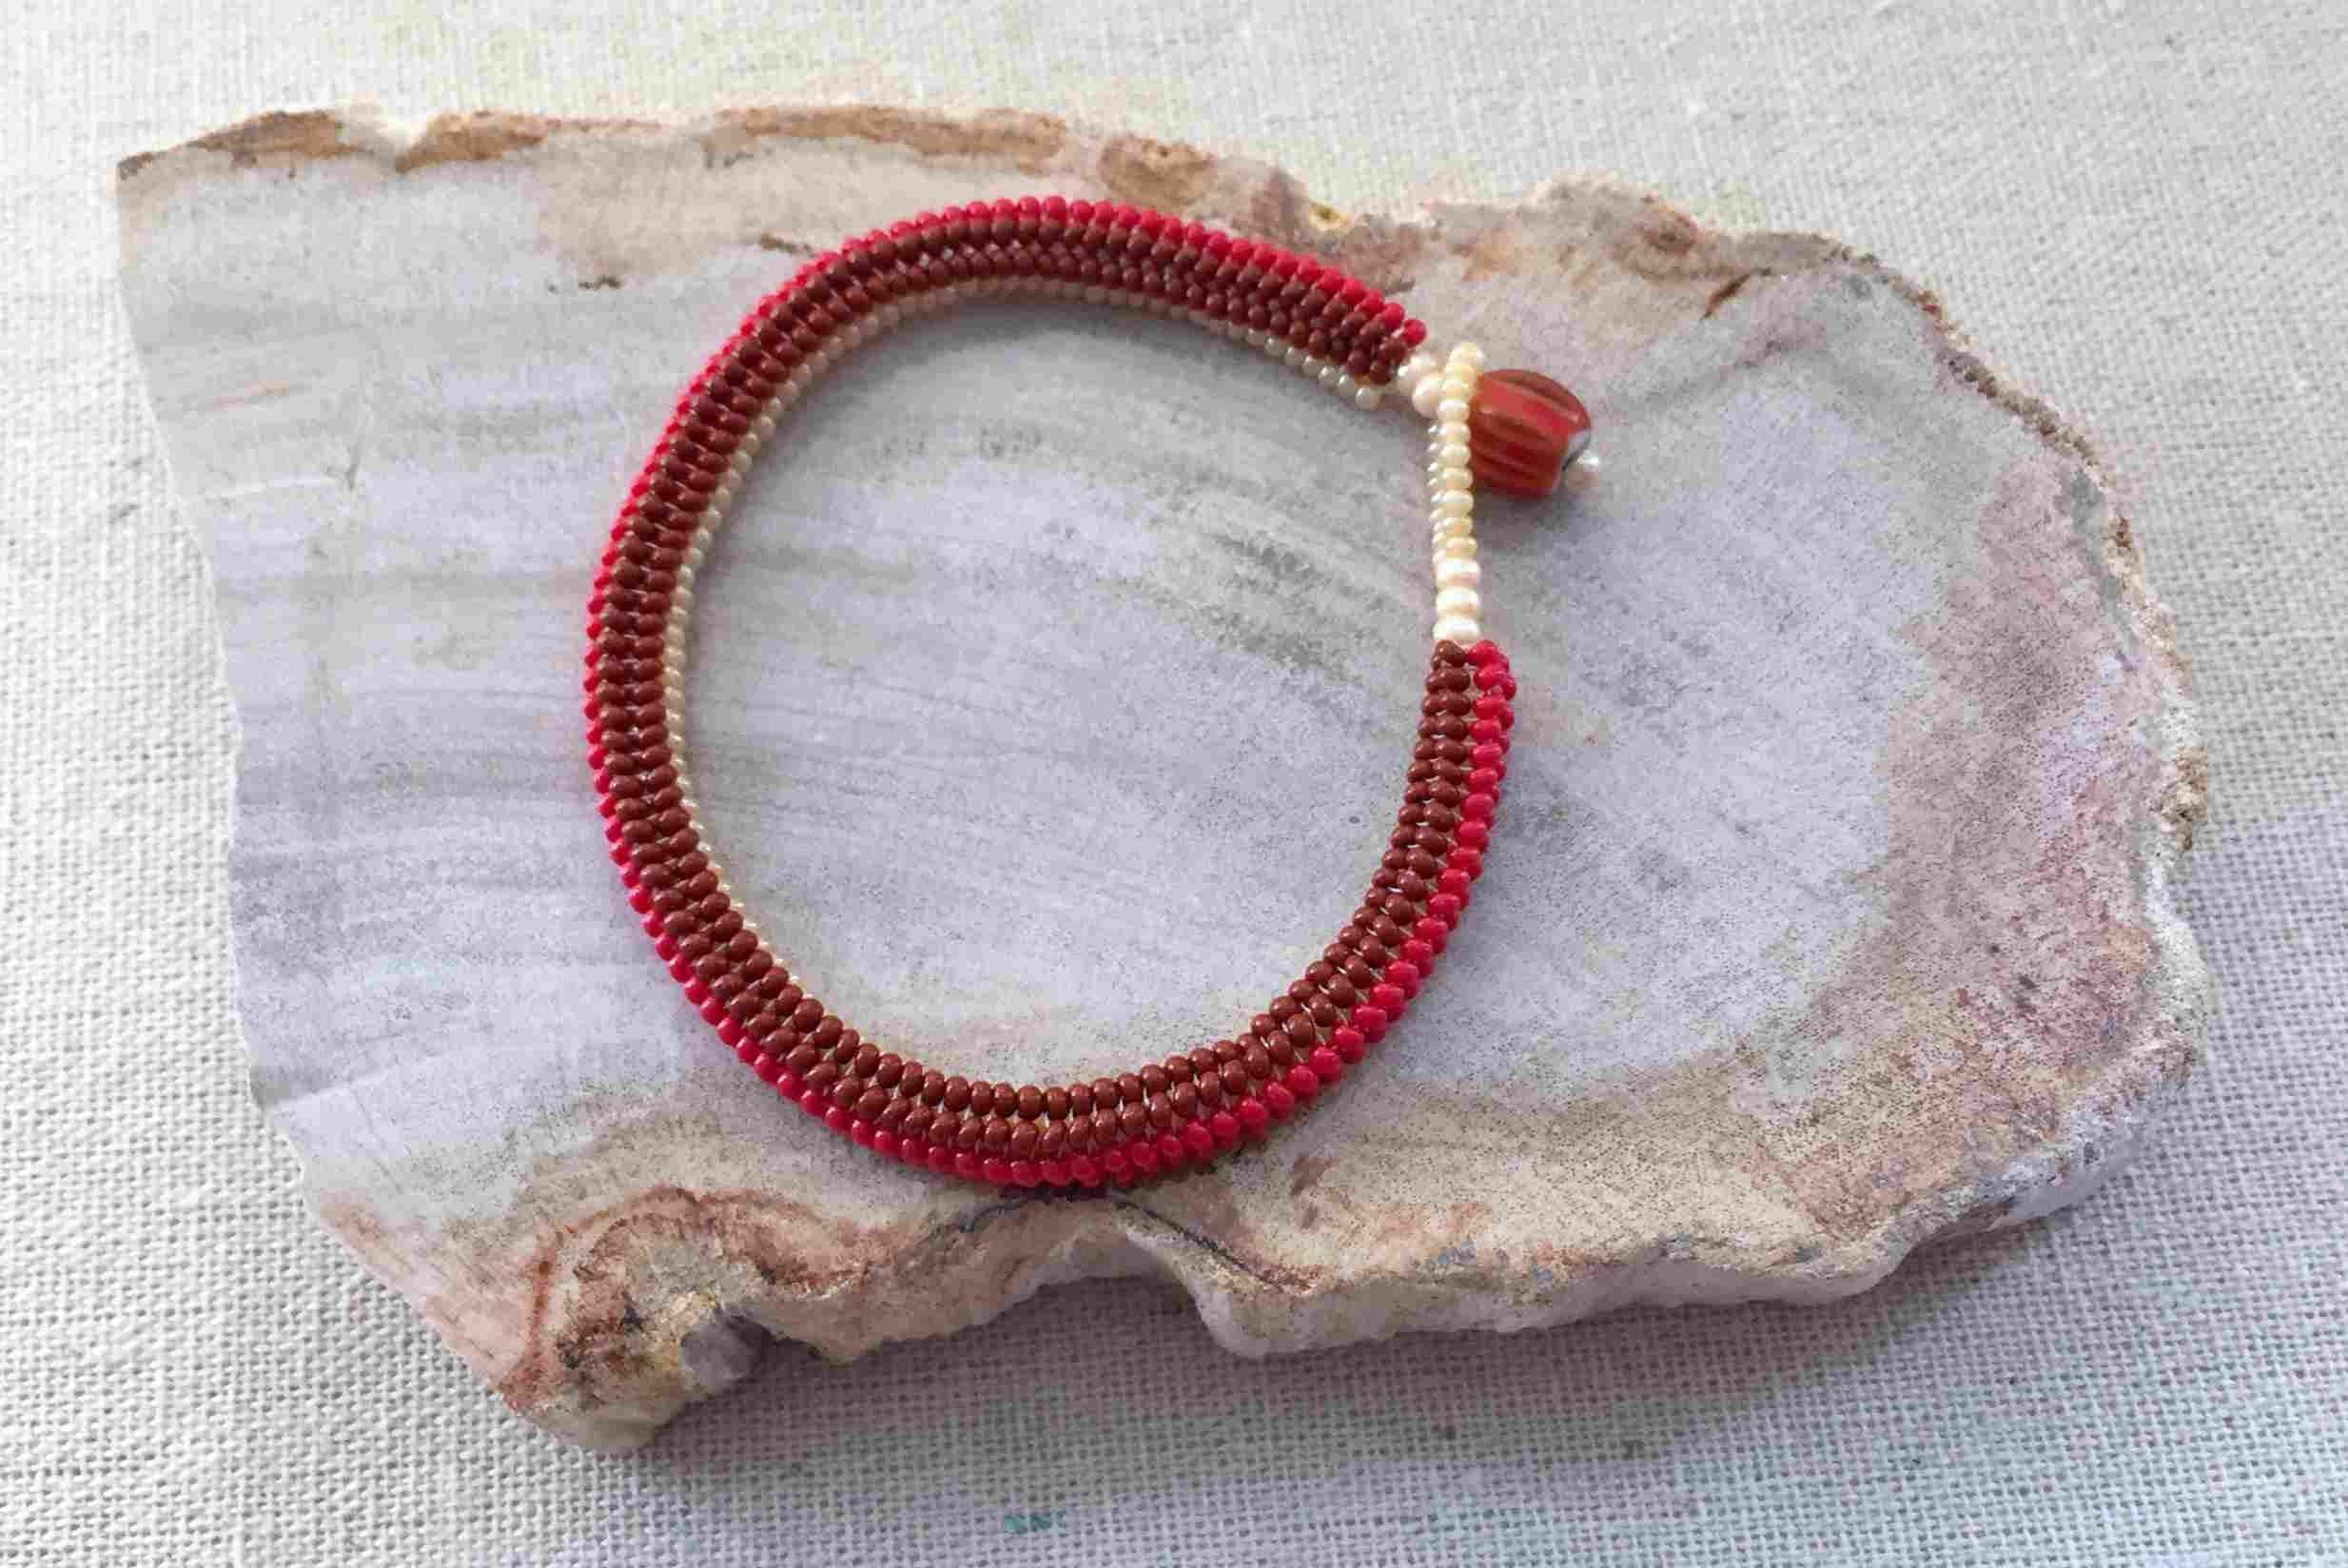 Tubular Herringbone Bracelet